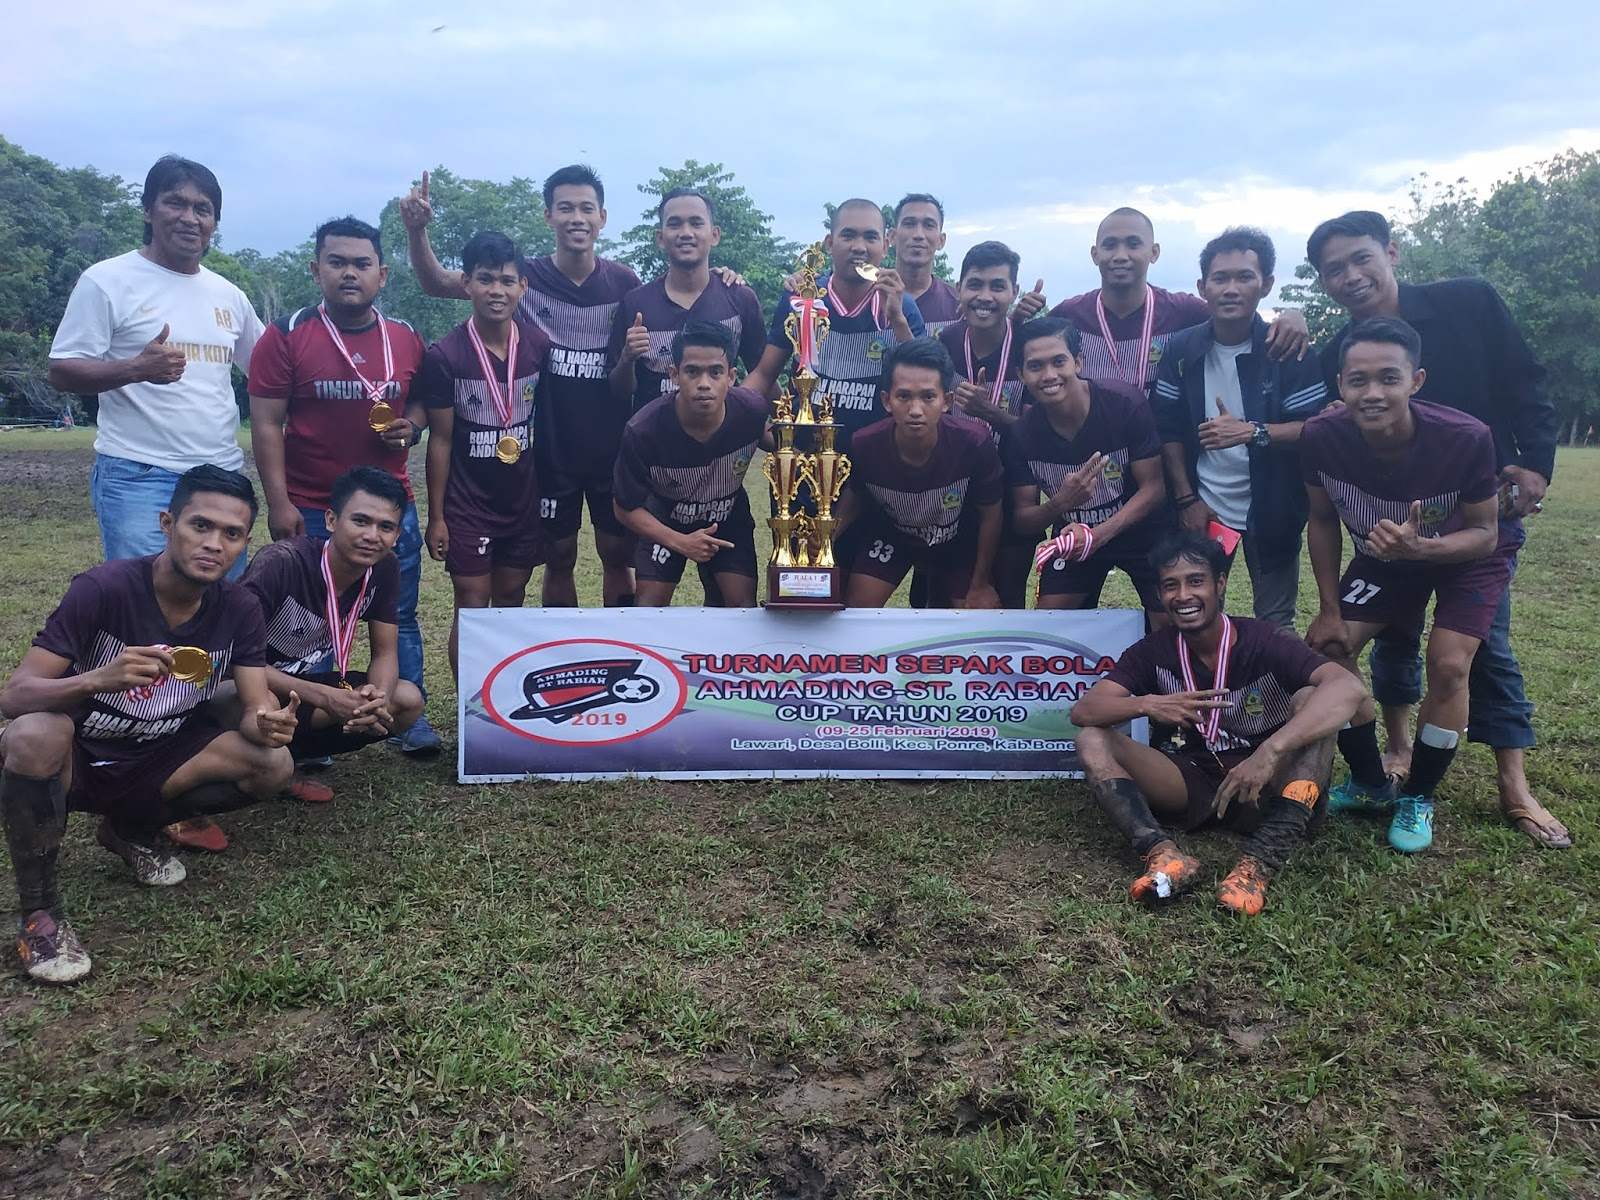 Timur Kota A Berhasil Juara I di Turnamen Sepak Bola Ahmading-St Rabiah Cup 2019